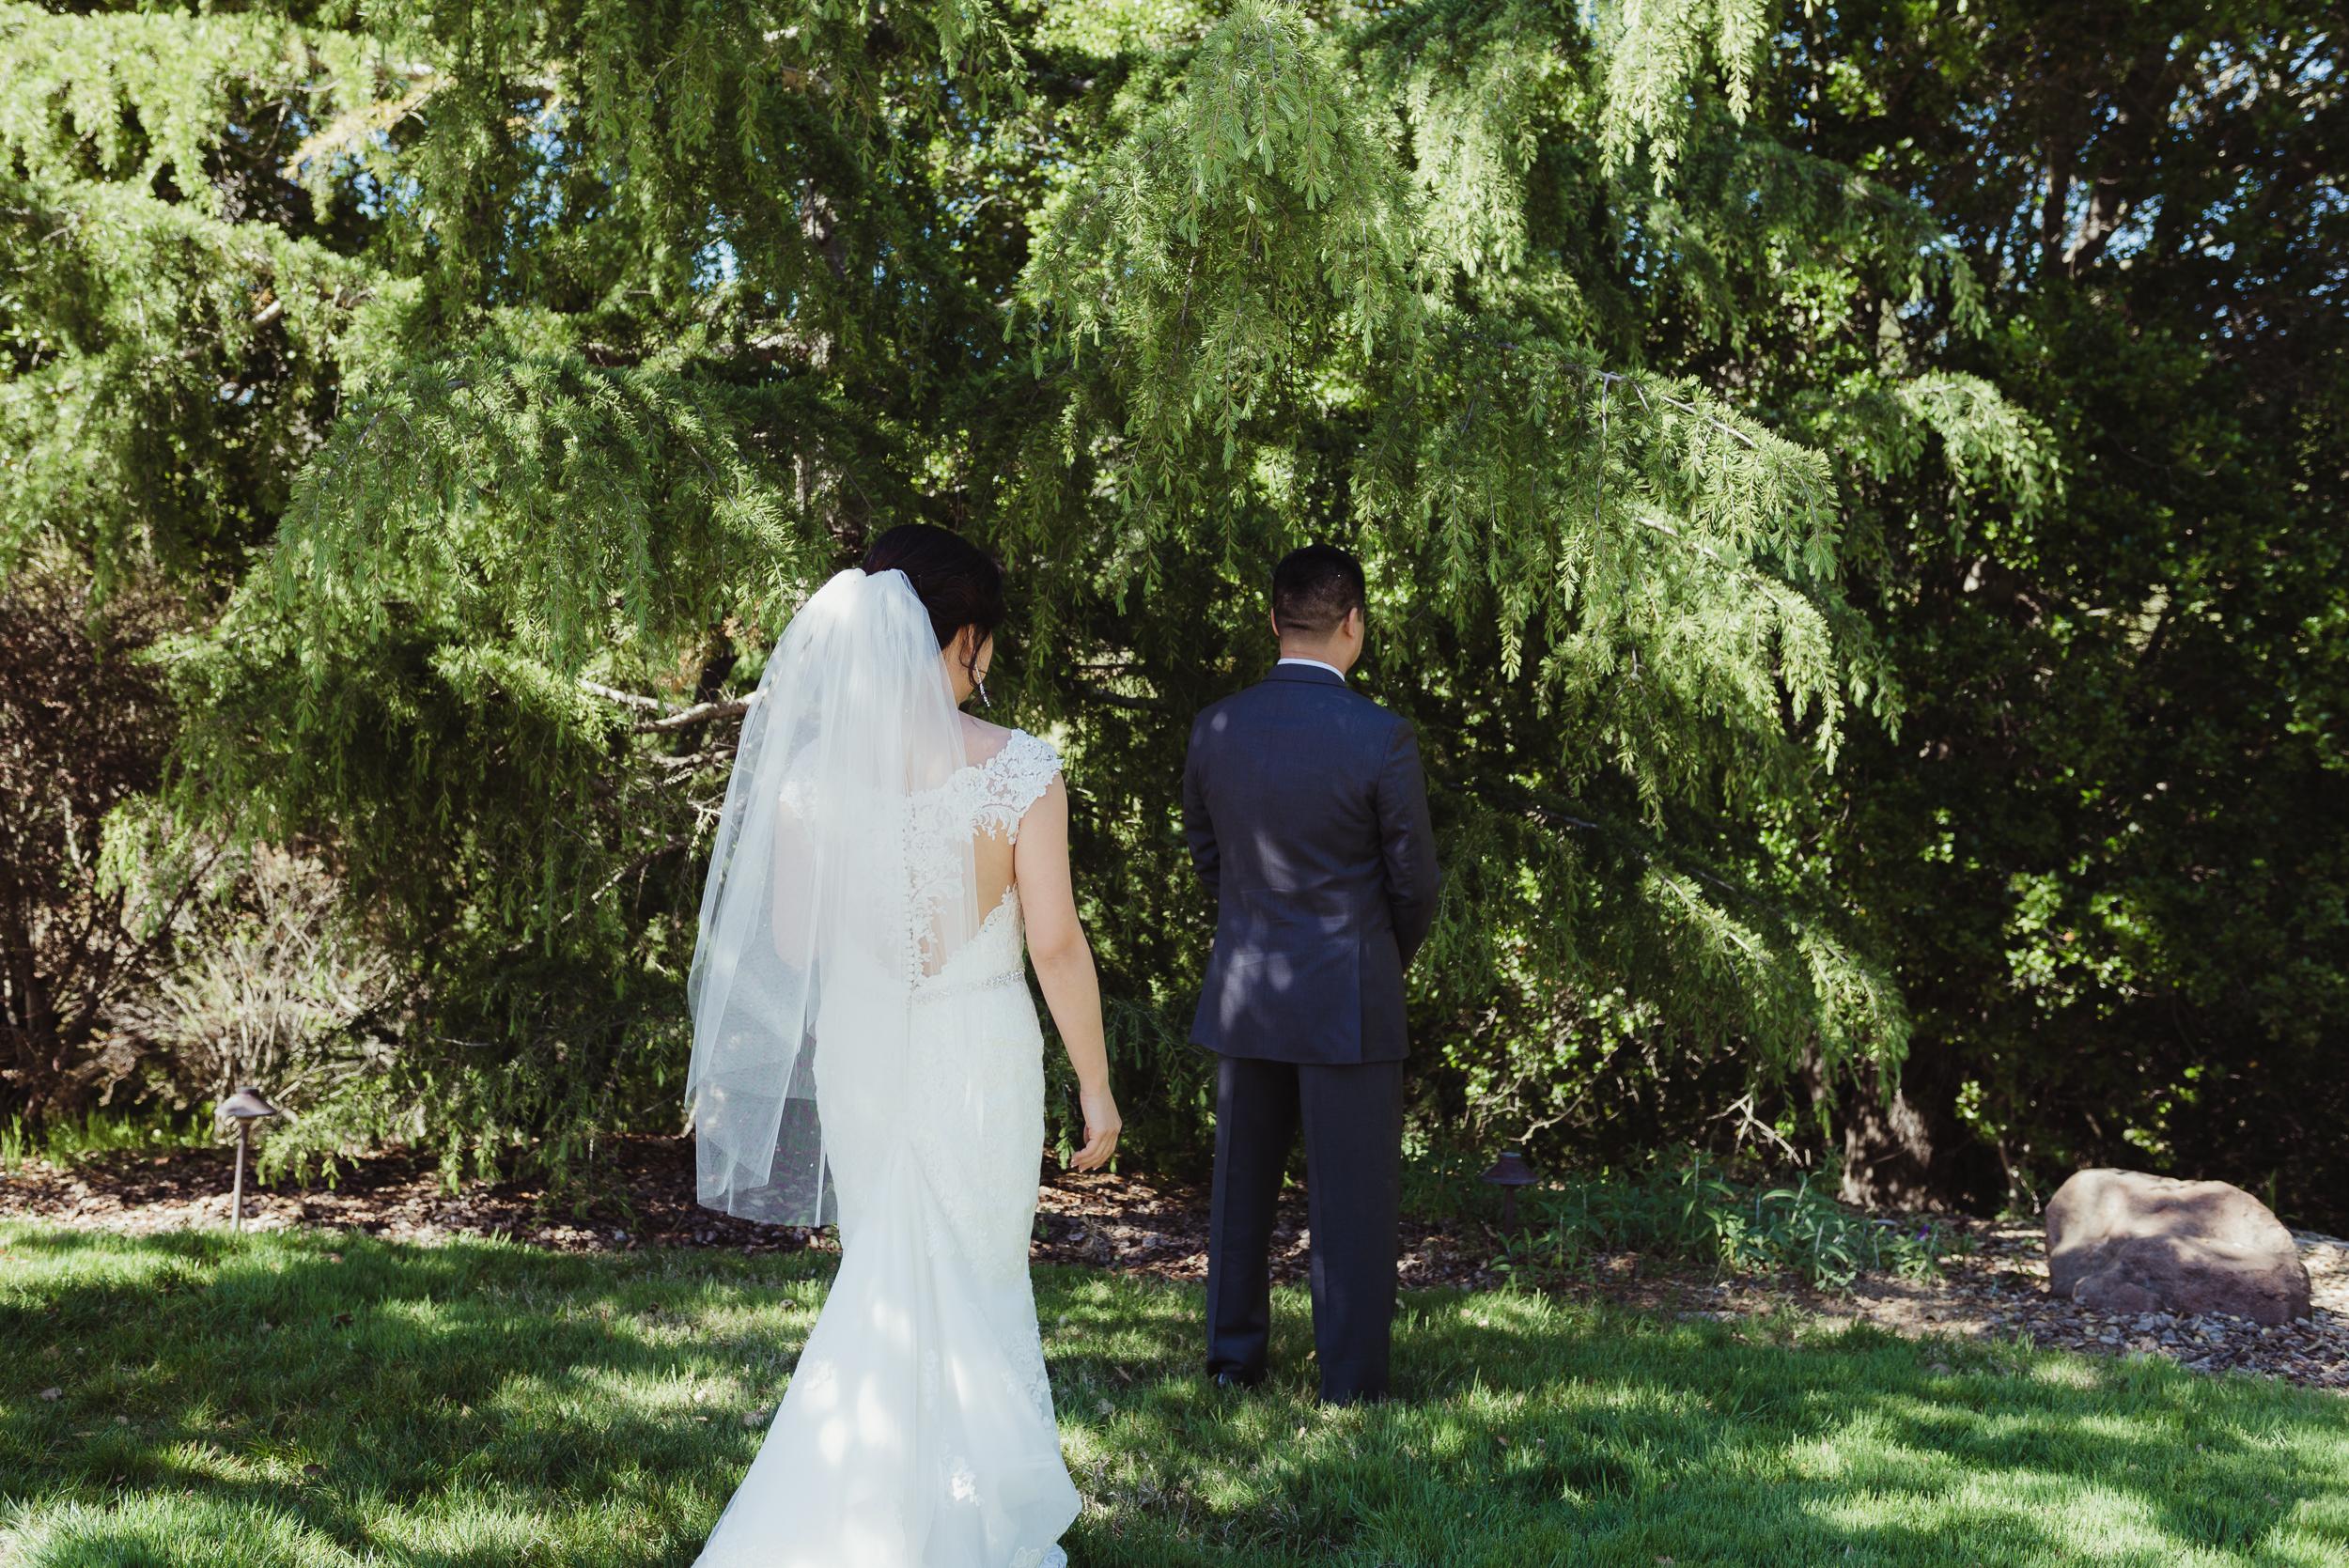 10-saratoga-country-club-wedding-vivianchen-134.jpg